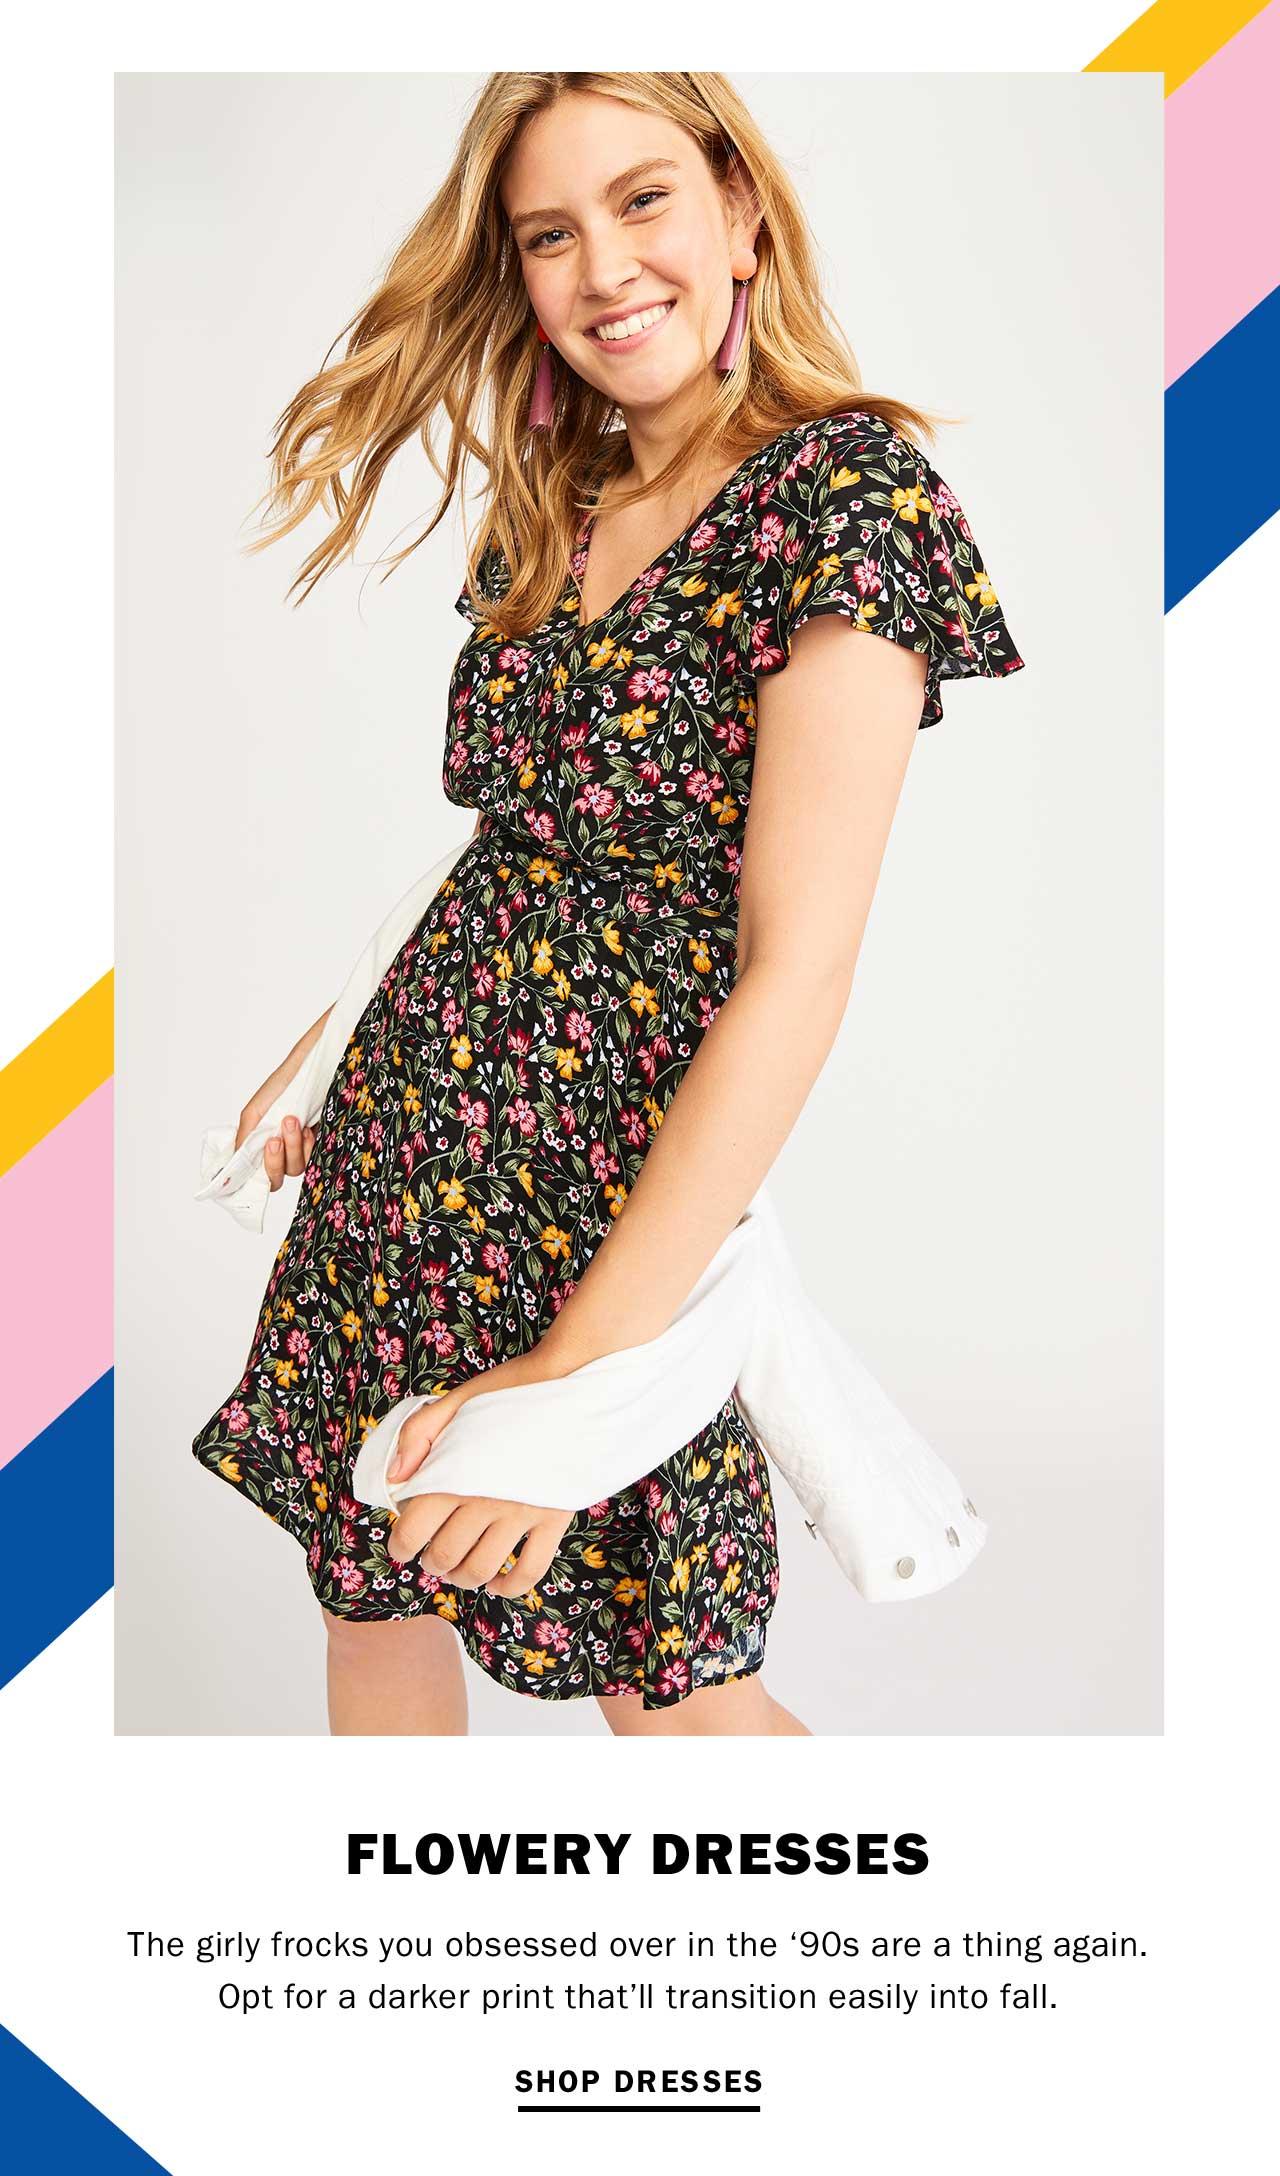 FLOWERY DRESSES | SHOP DRESSES